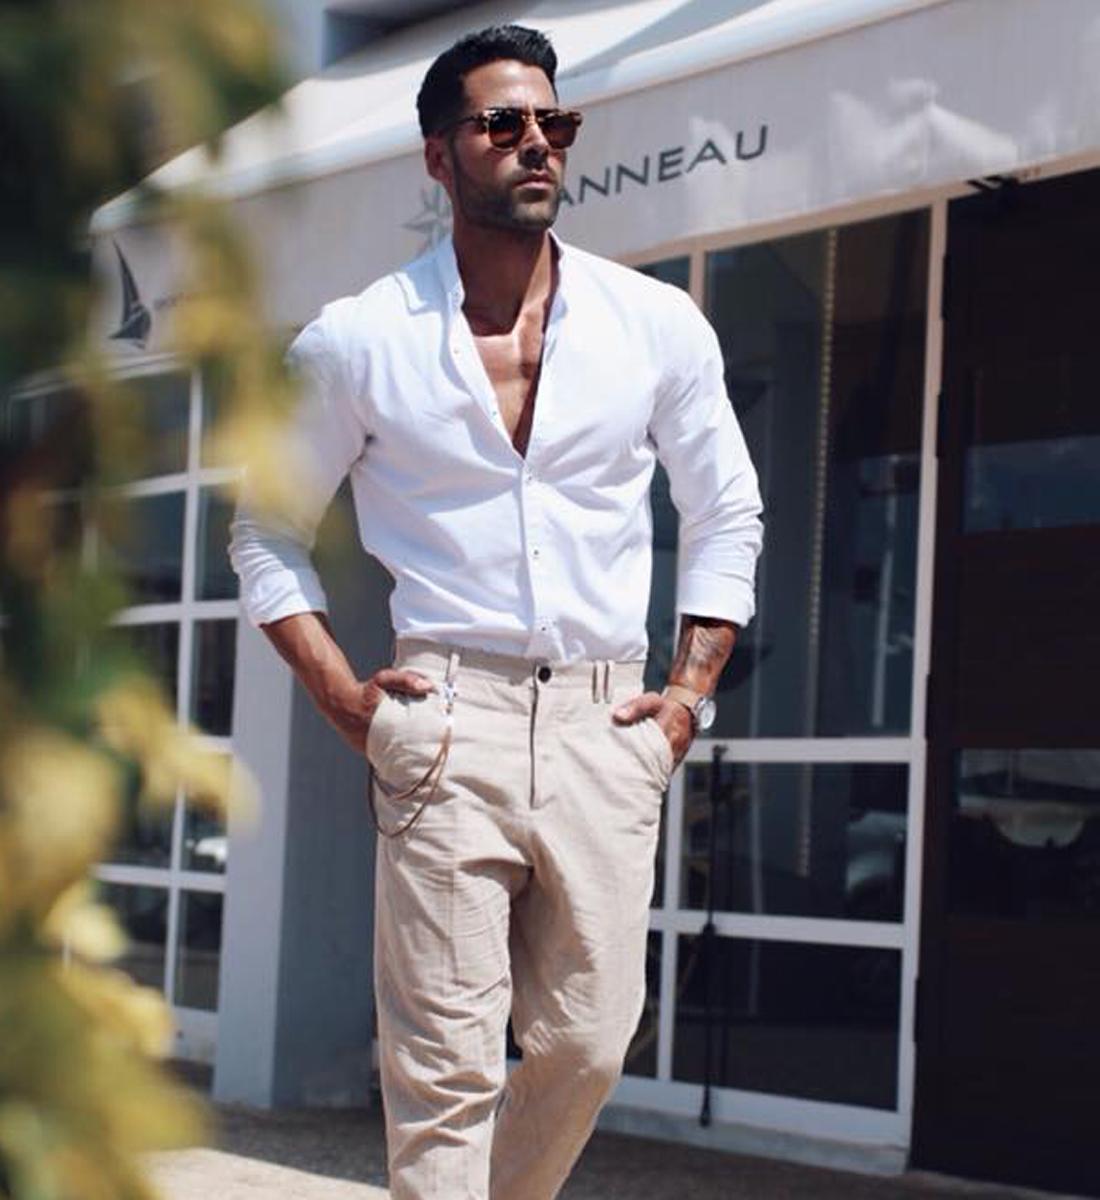 70ddcca1b05 Έτσι μπορείς να συνδυάσεις τέλεια τα ρούχα σου το καλοκαίρι και να ...